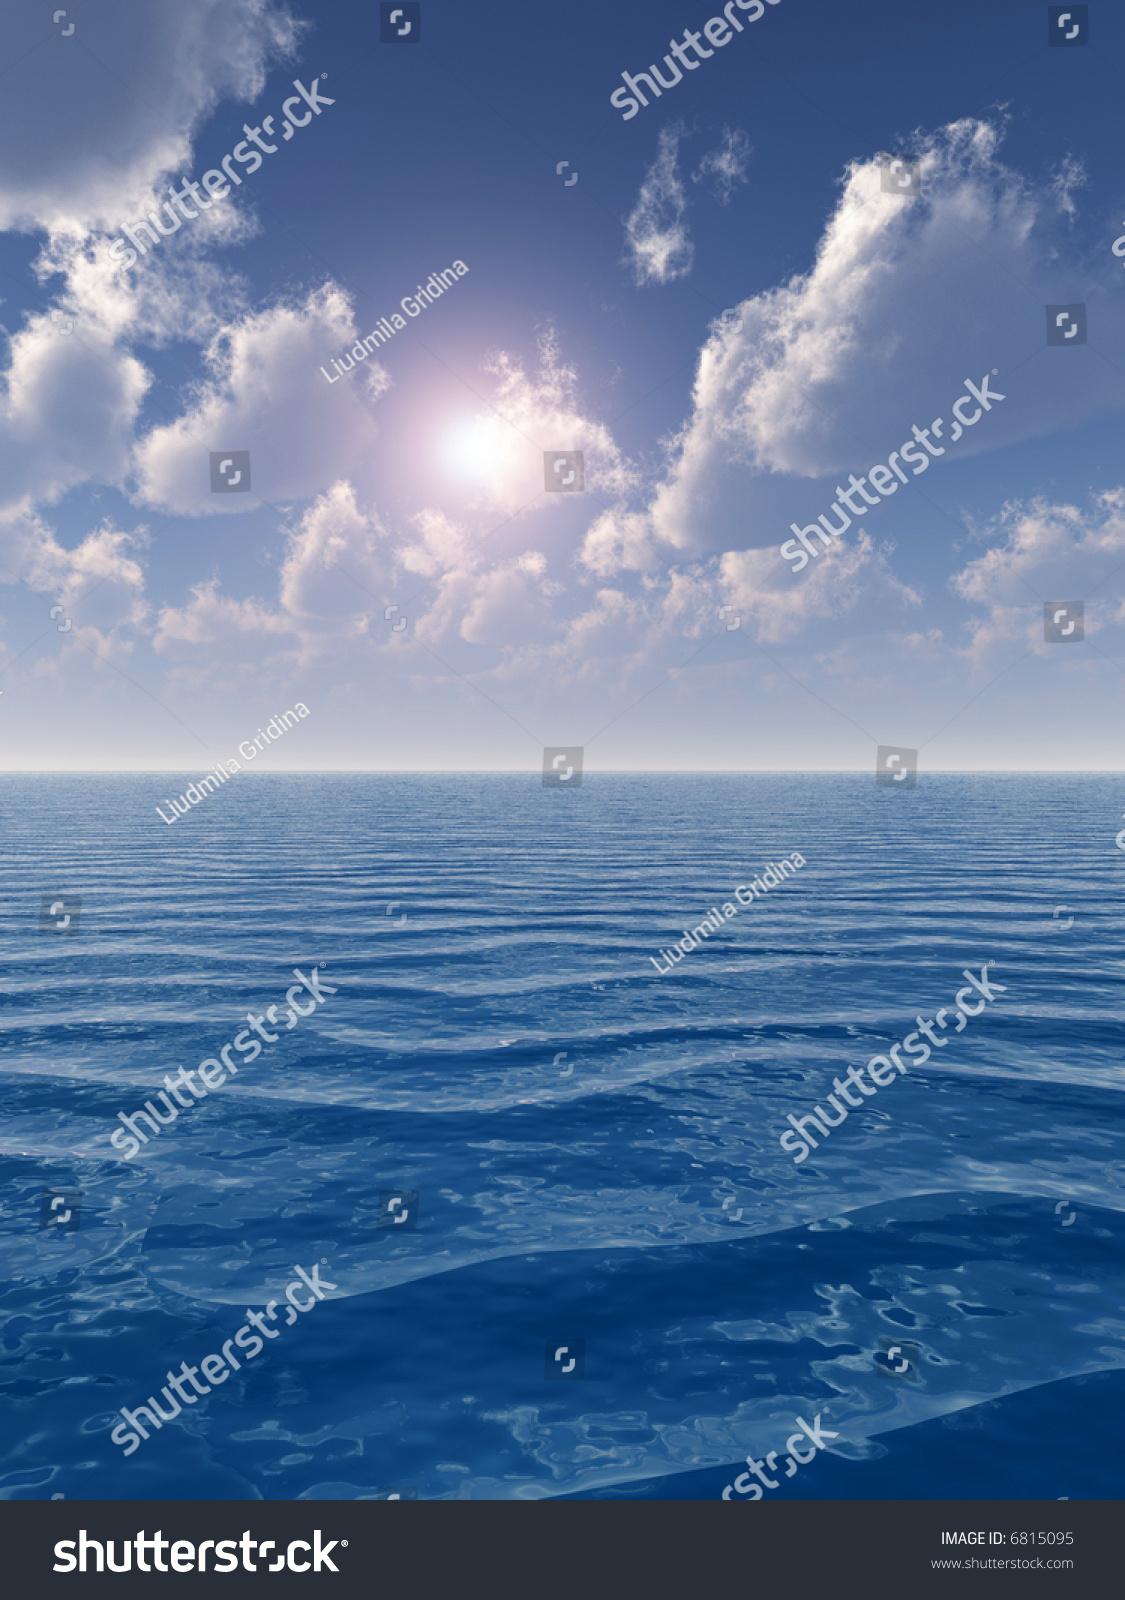 Beautiful Sea Clouds Sky Digital Artwork Stock